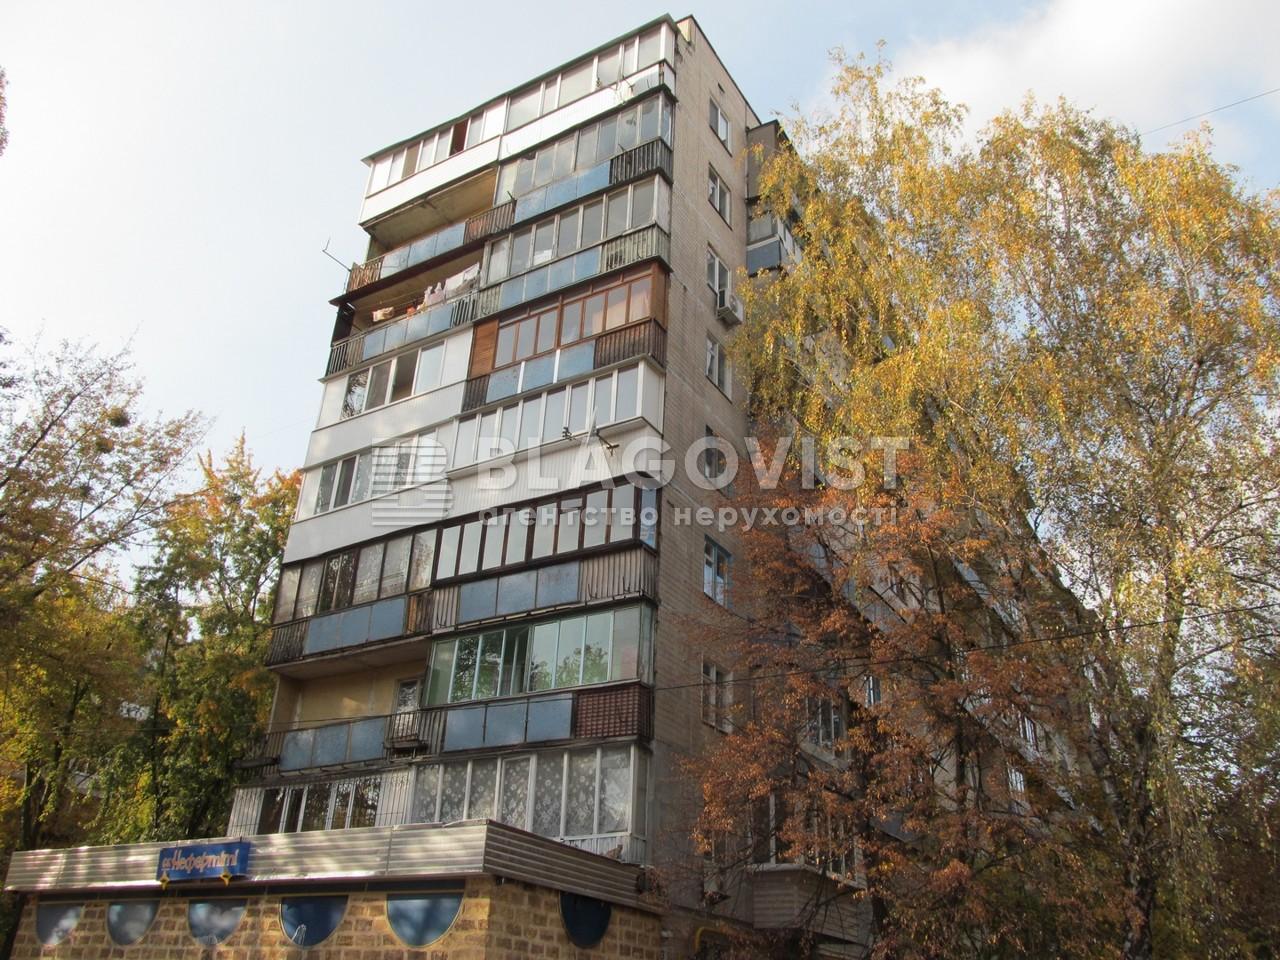 Квартира A-108618, Роллана Ромена бульв., 13б, Киев - Фото 3